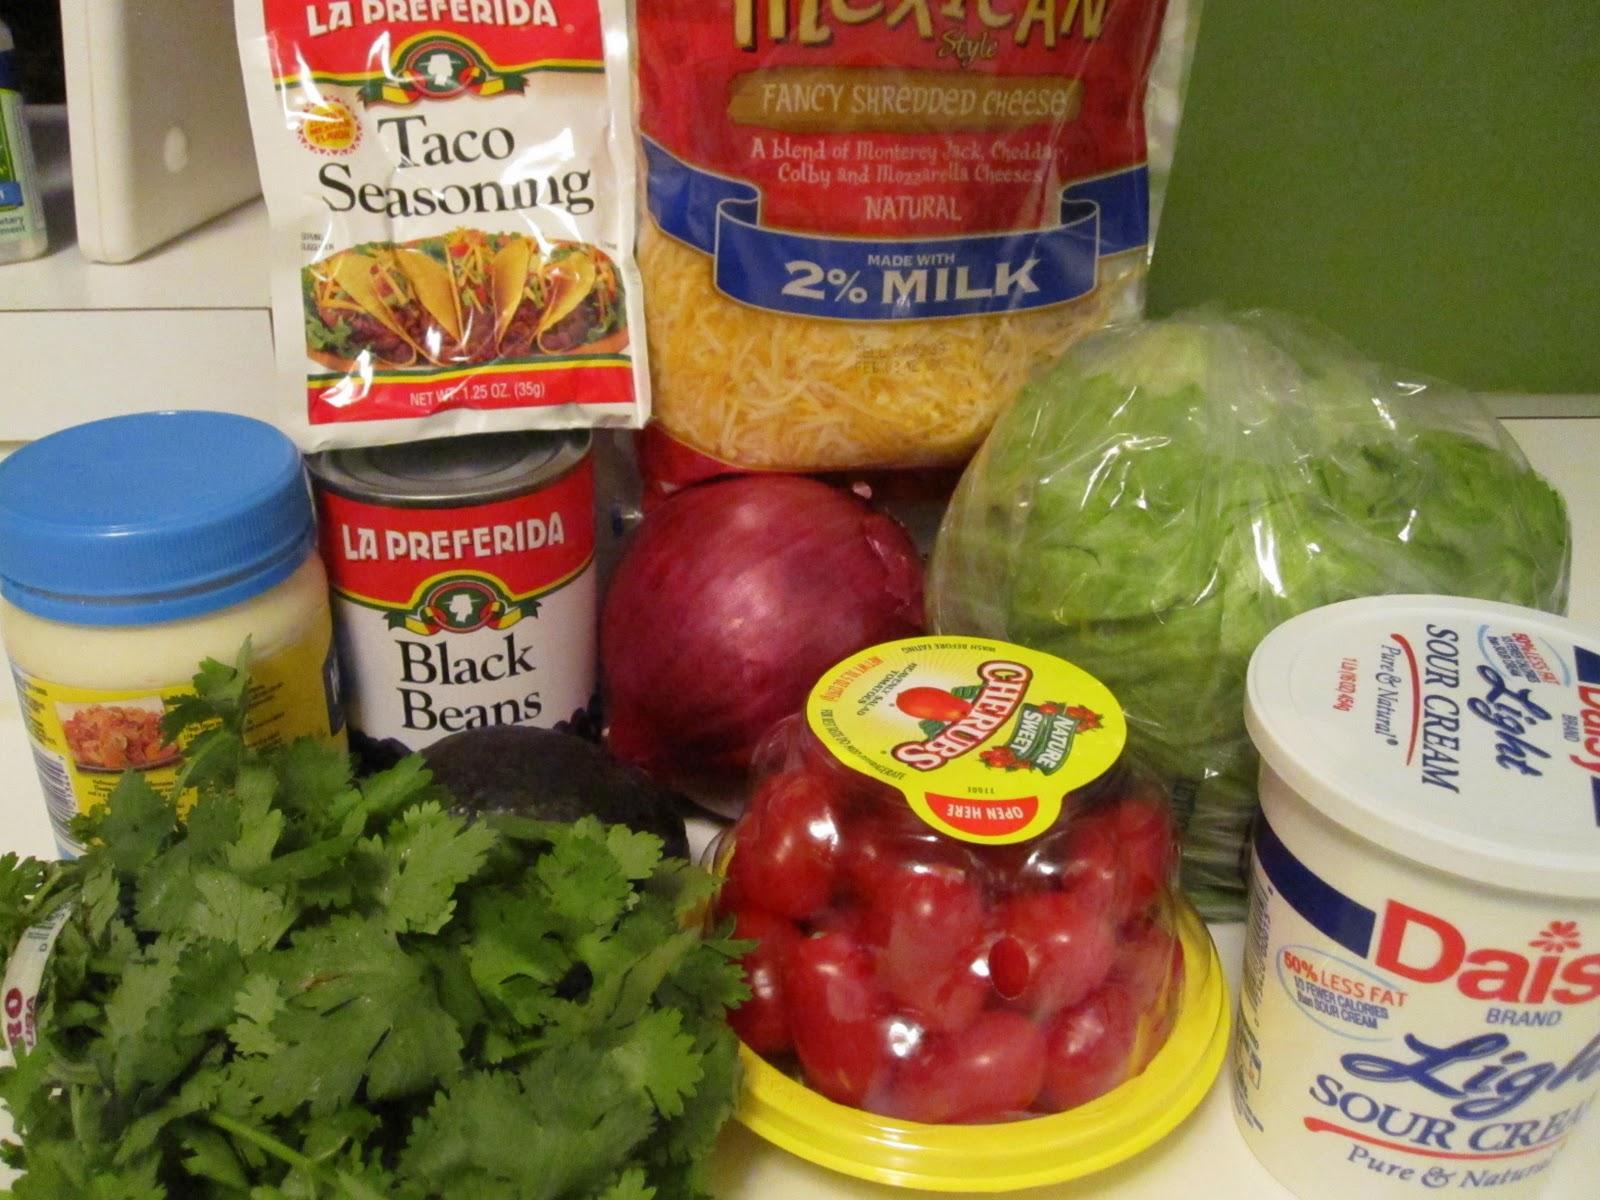 Elizabeth's Dutch Oven: Layered Tex-Mex Taco Salad